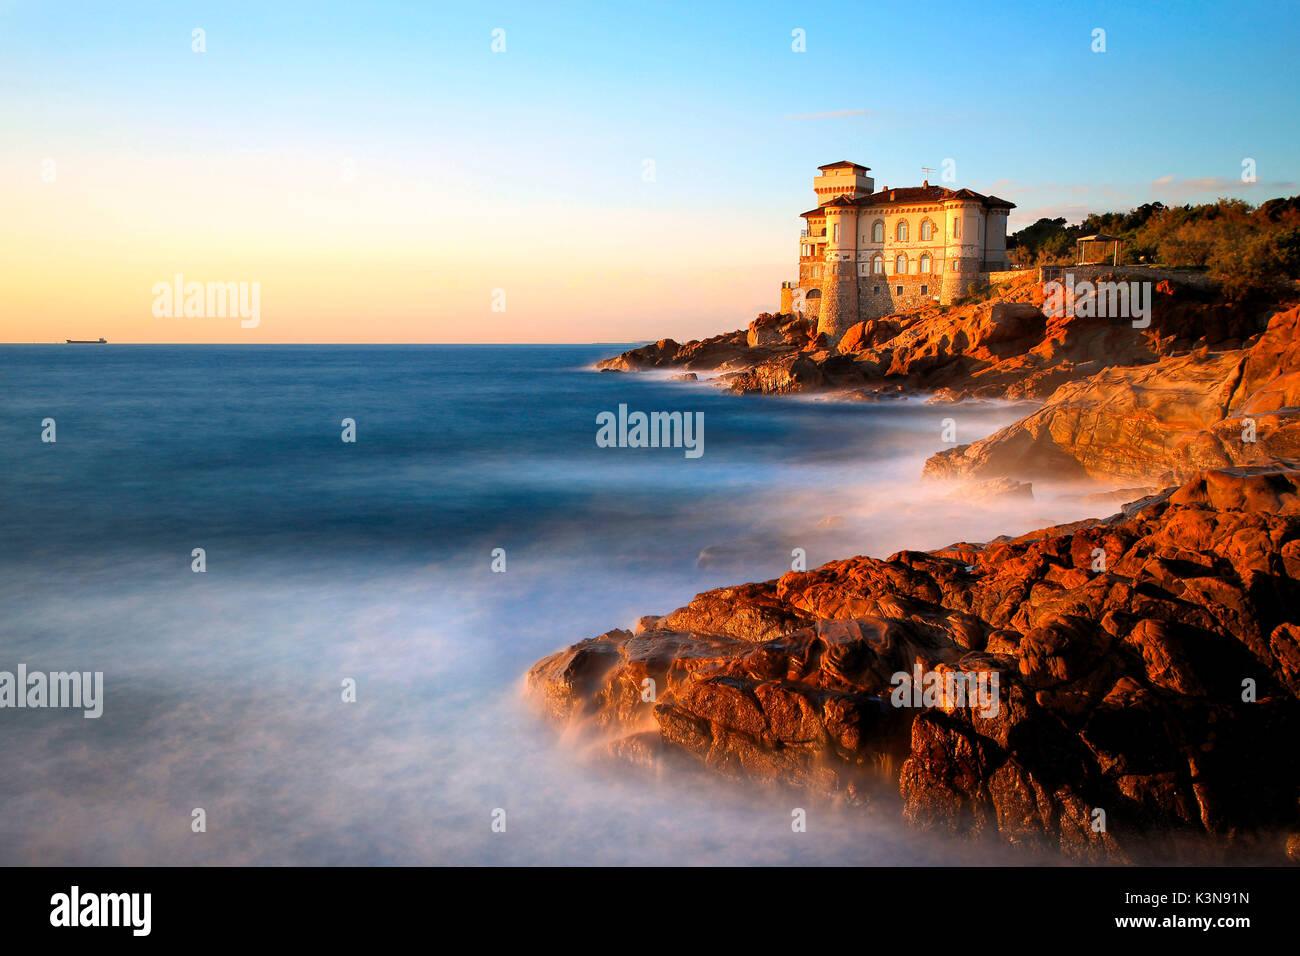 Boccale Castle, Livorno district, Tuscany, Italy - Stock Image